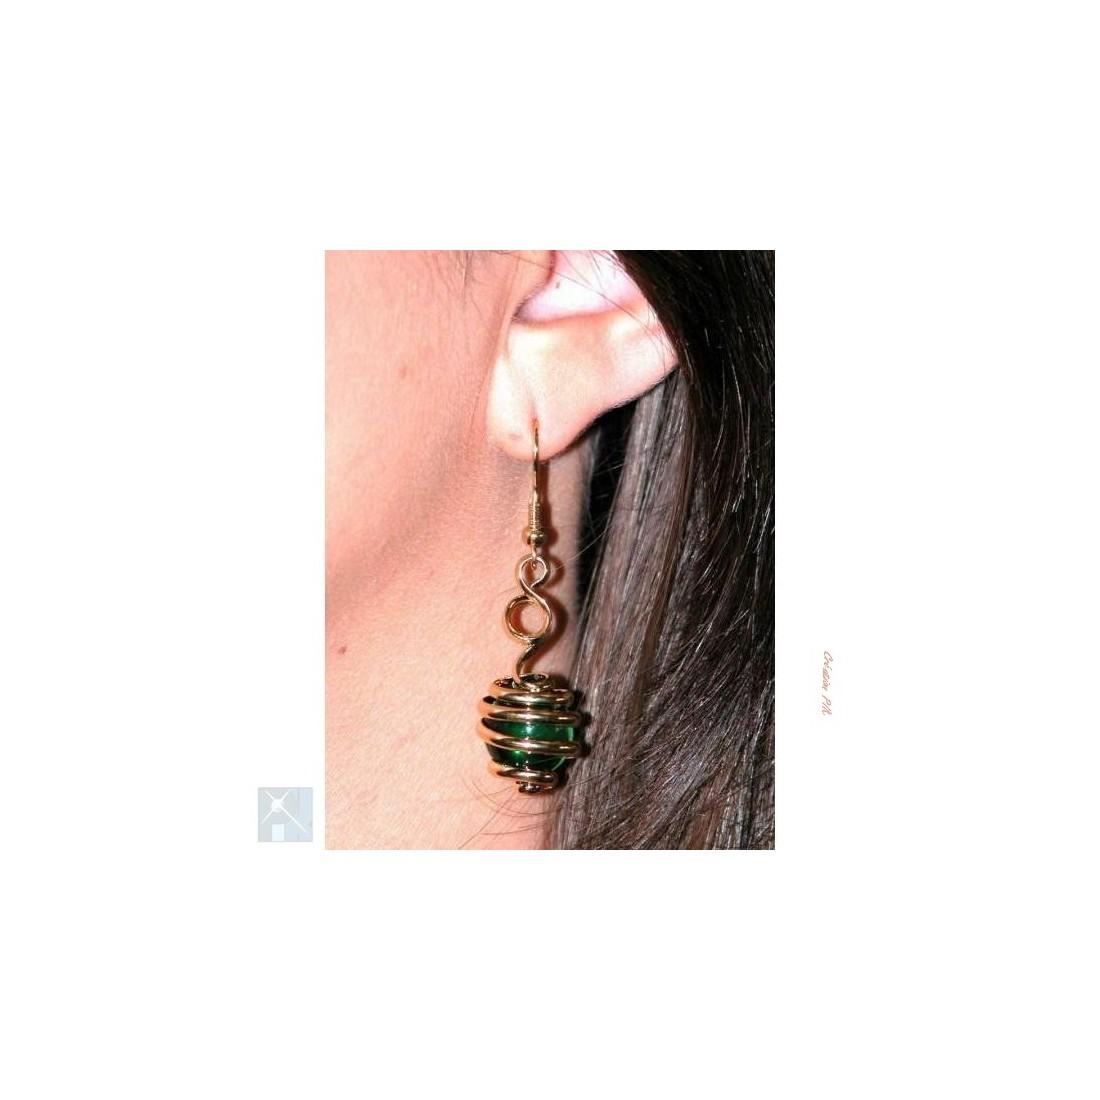 Boucles d'oreilles dorées, vert émeraude.